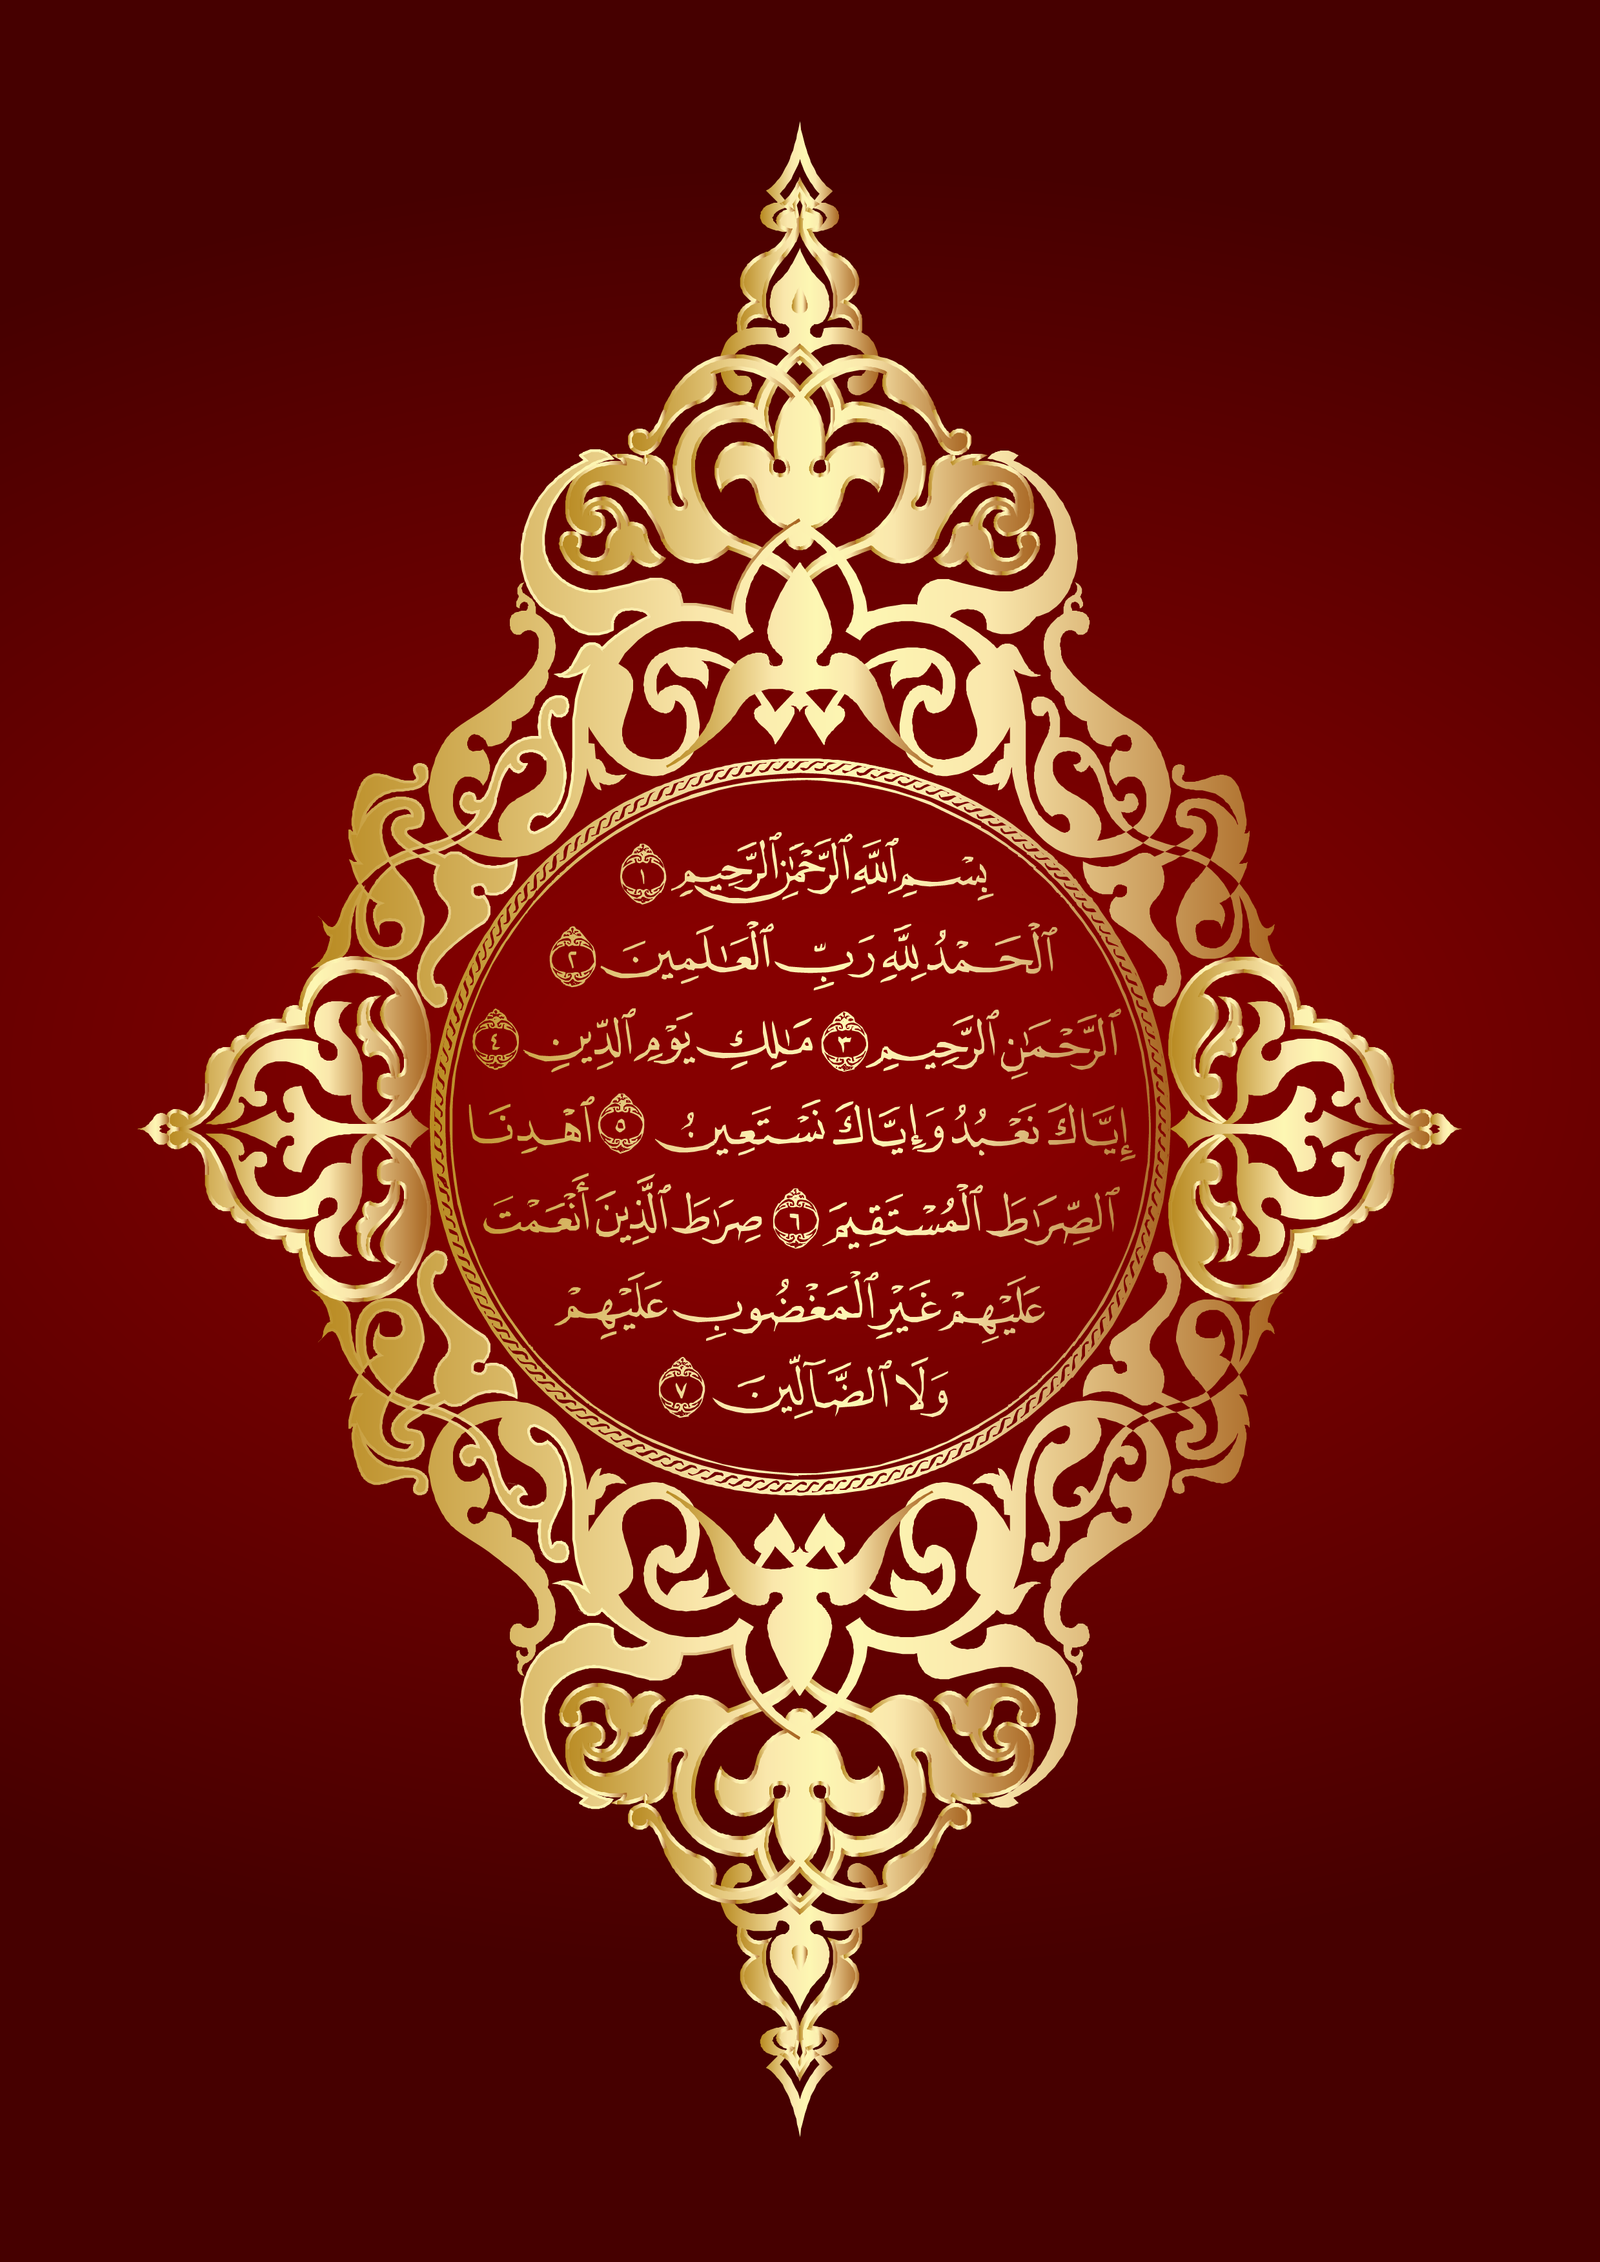 Book Cover Design Arabic ~ Quran by wajdinet on deviantart